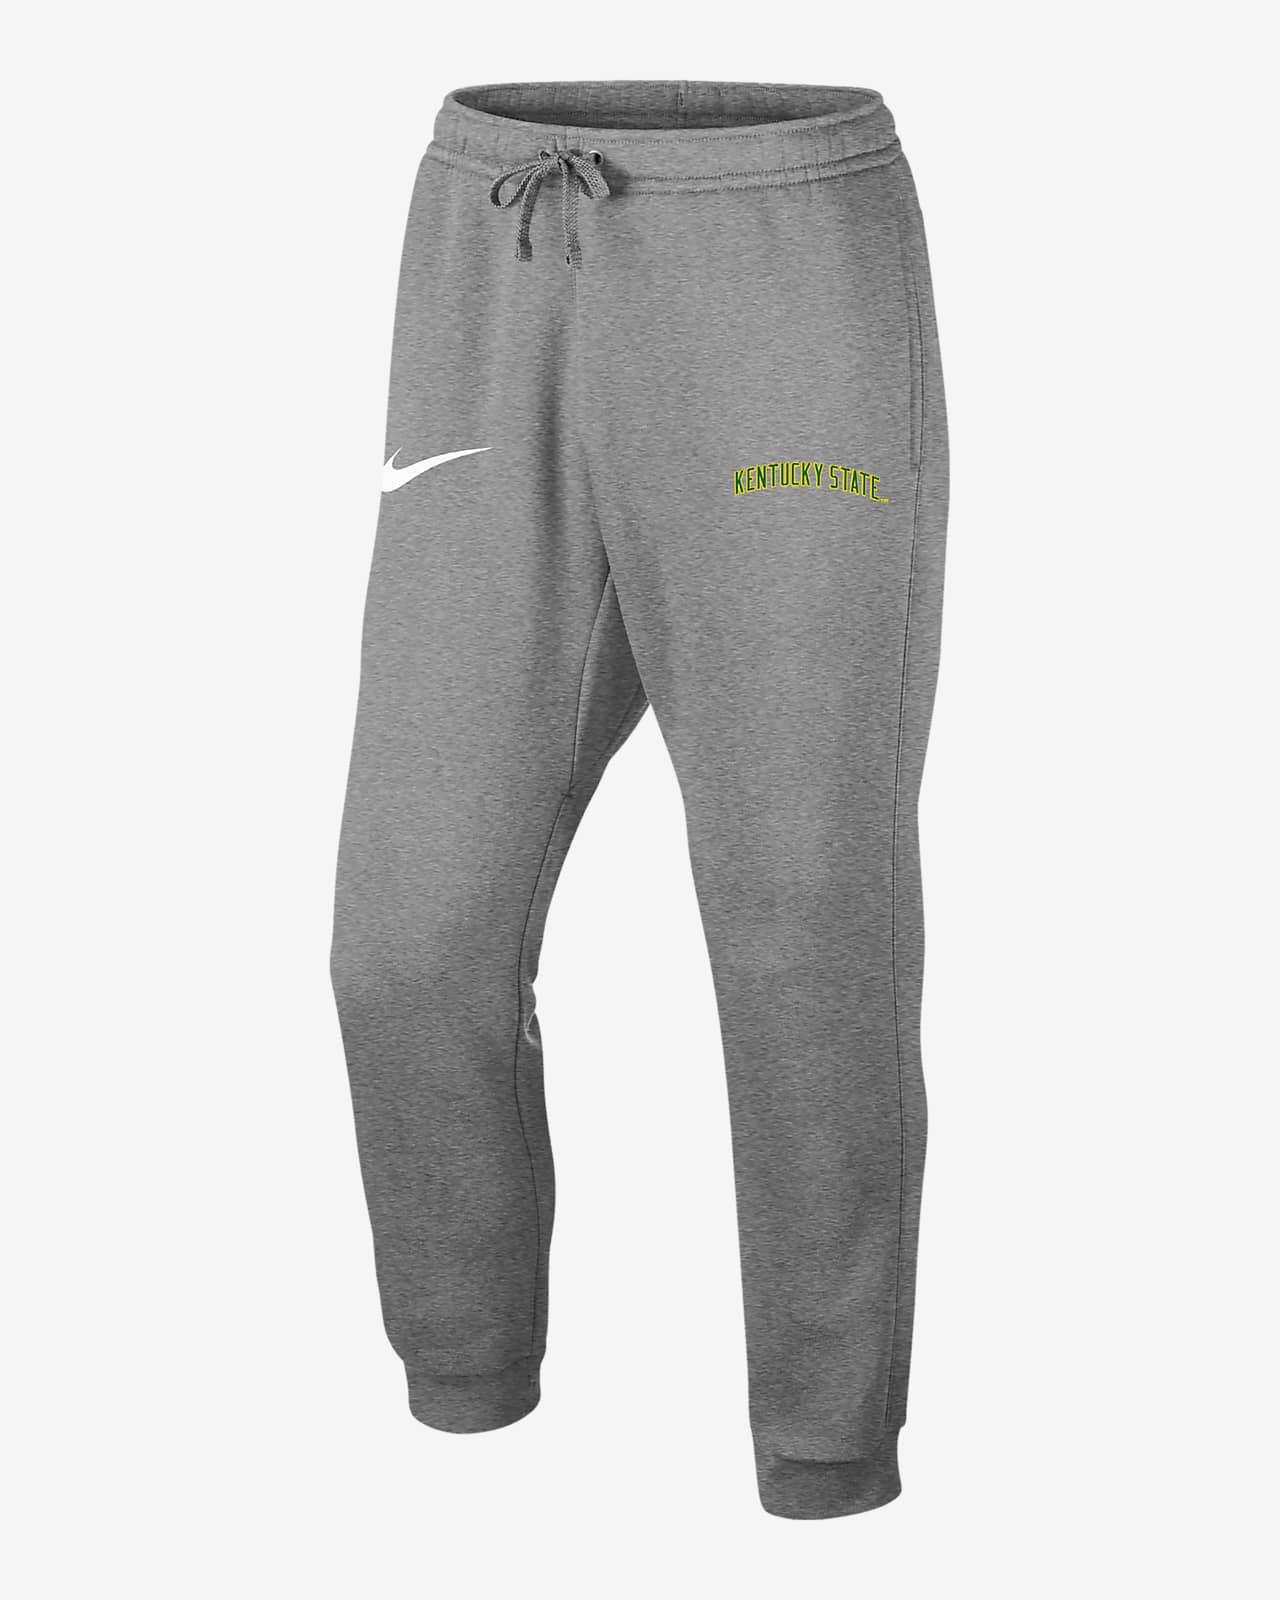 Nike College Club Fleece (Kentucky State) Joggers